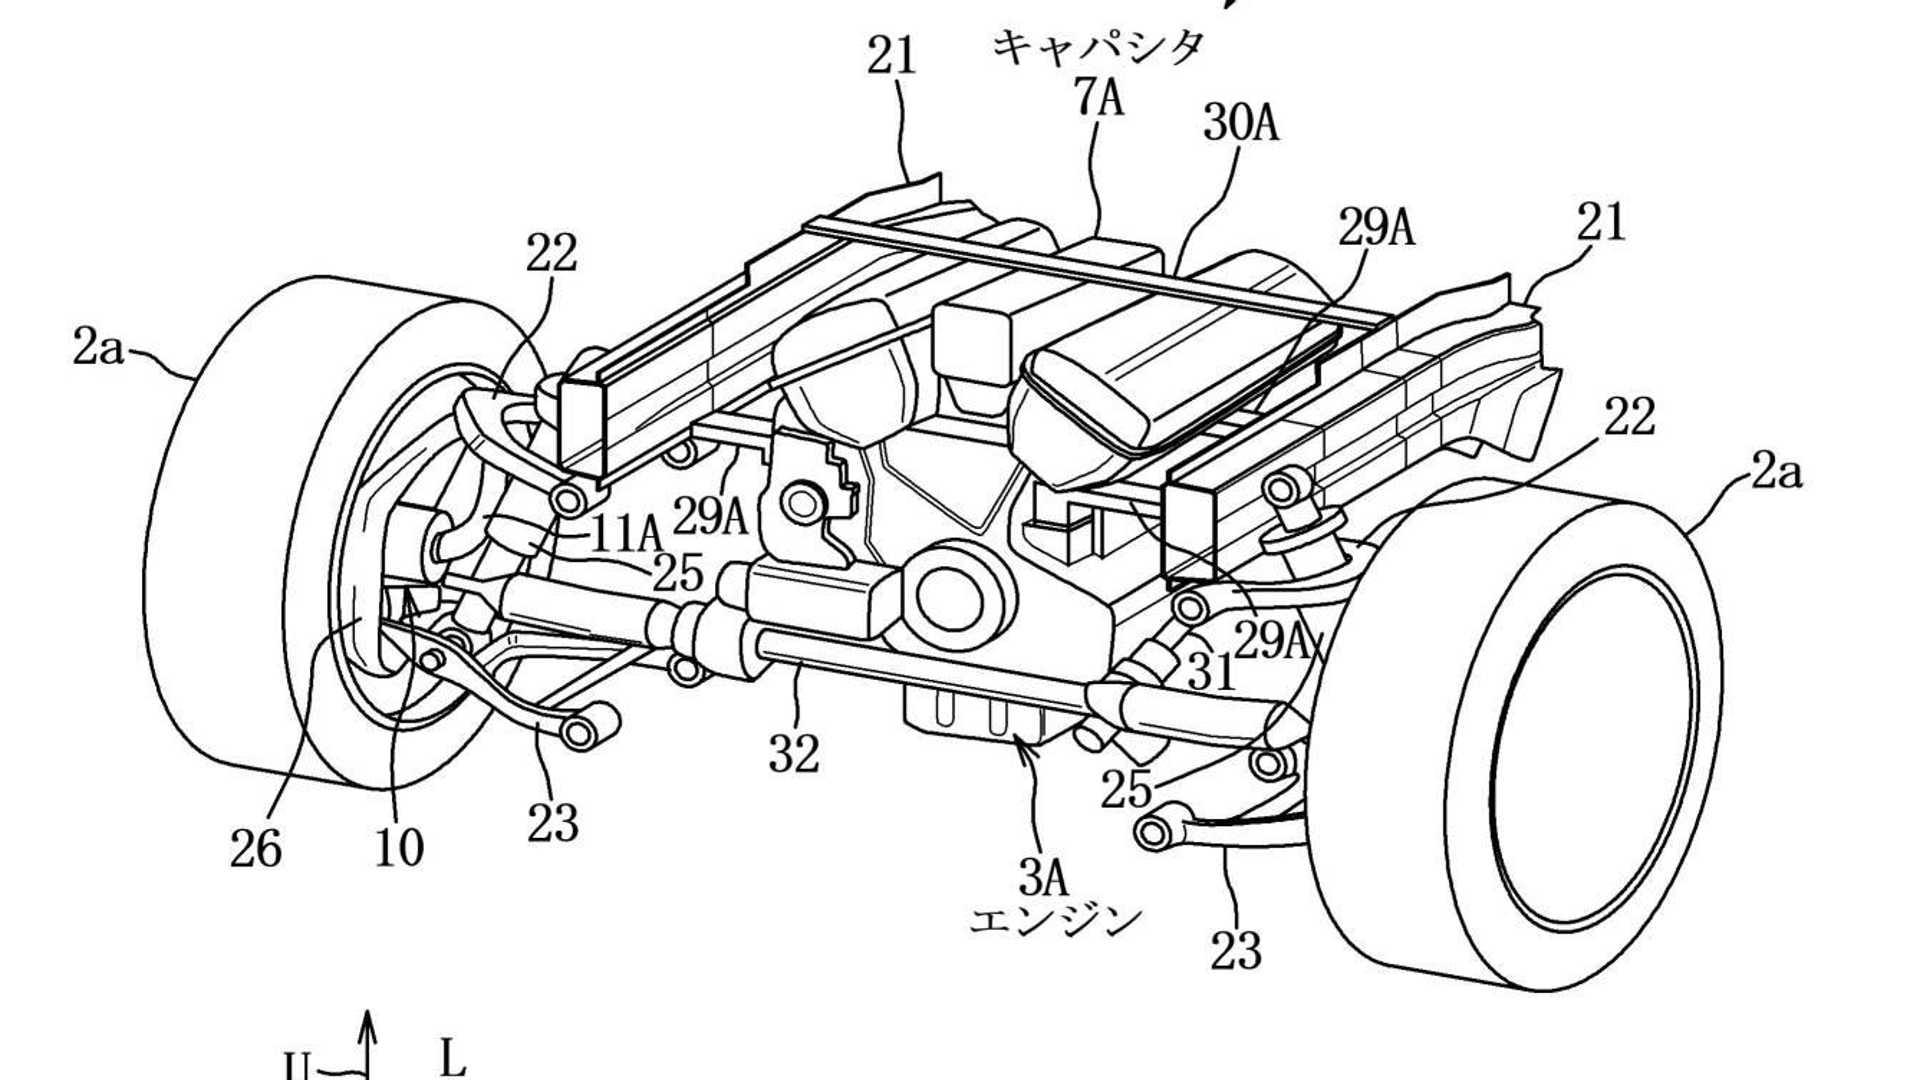 Mazda-Rotary-Engine-Hybrid-Patent-8